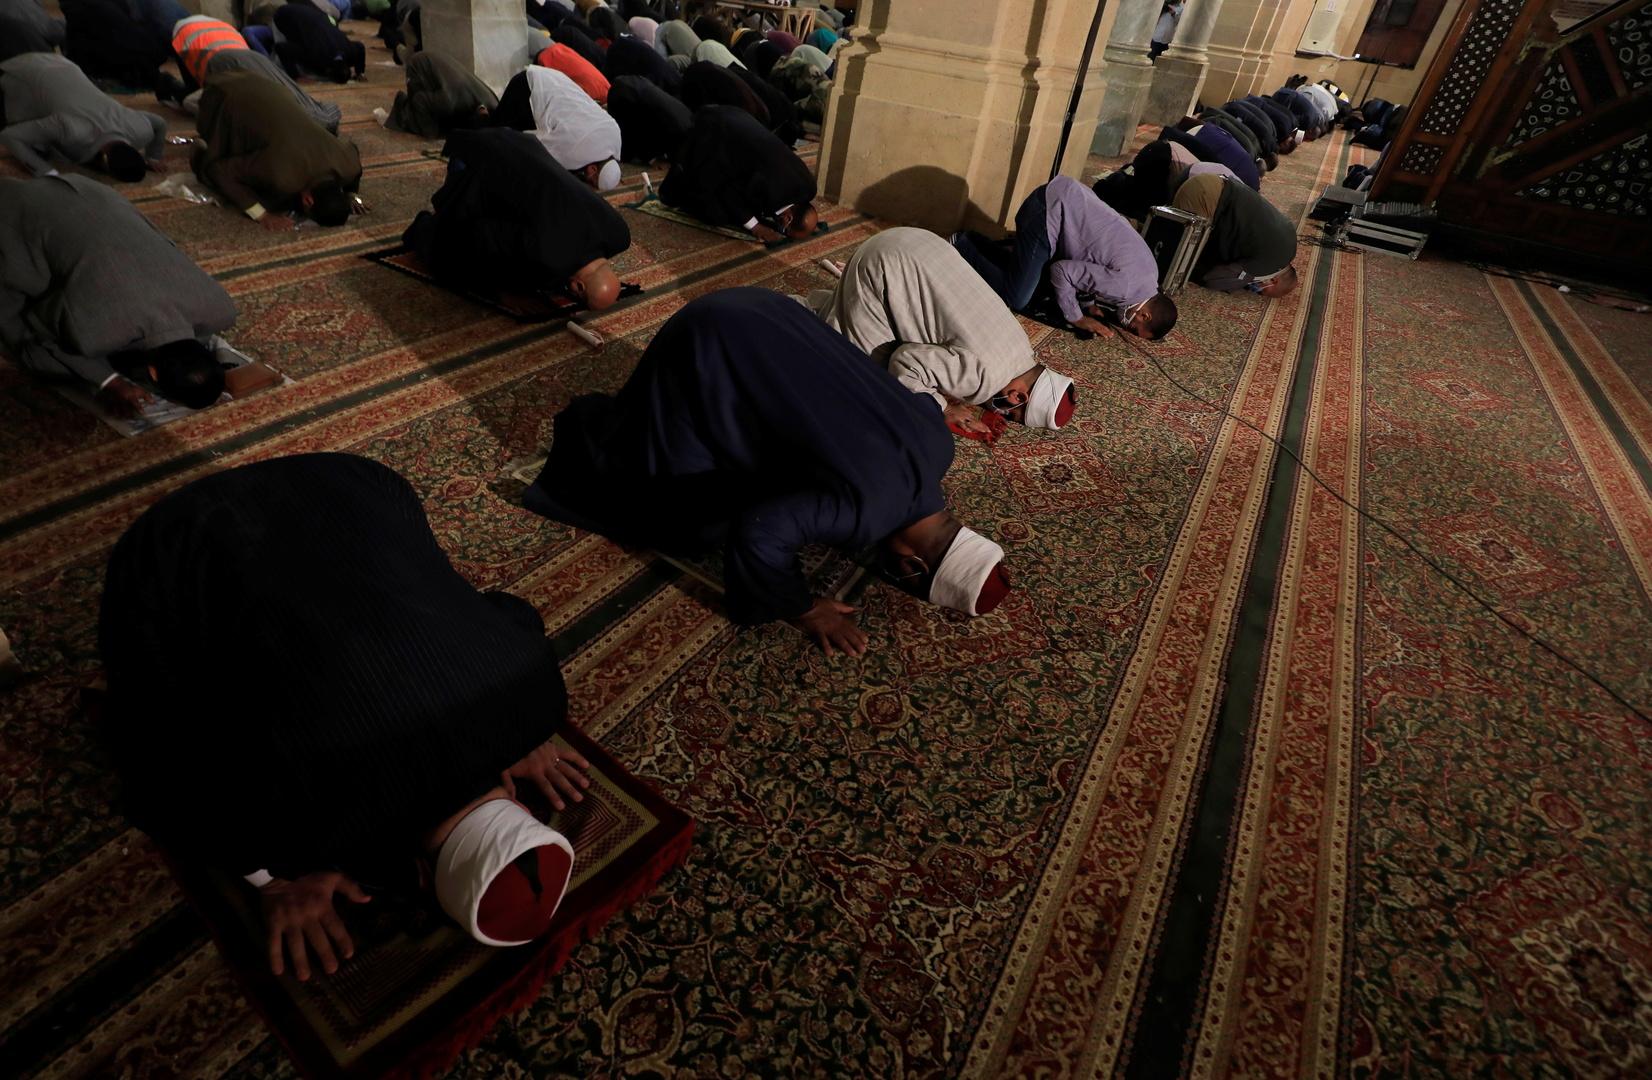 Egypt announces strict measures to close mosques